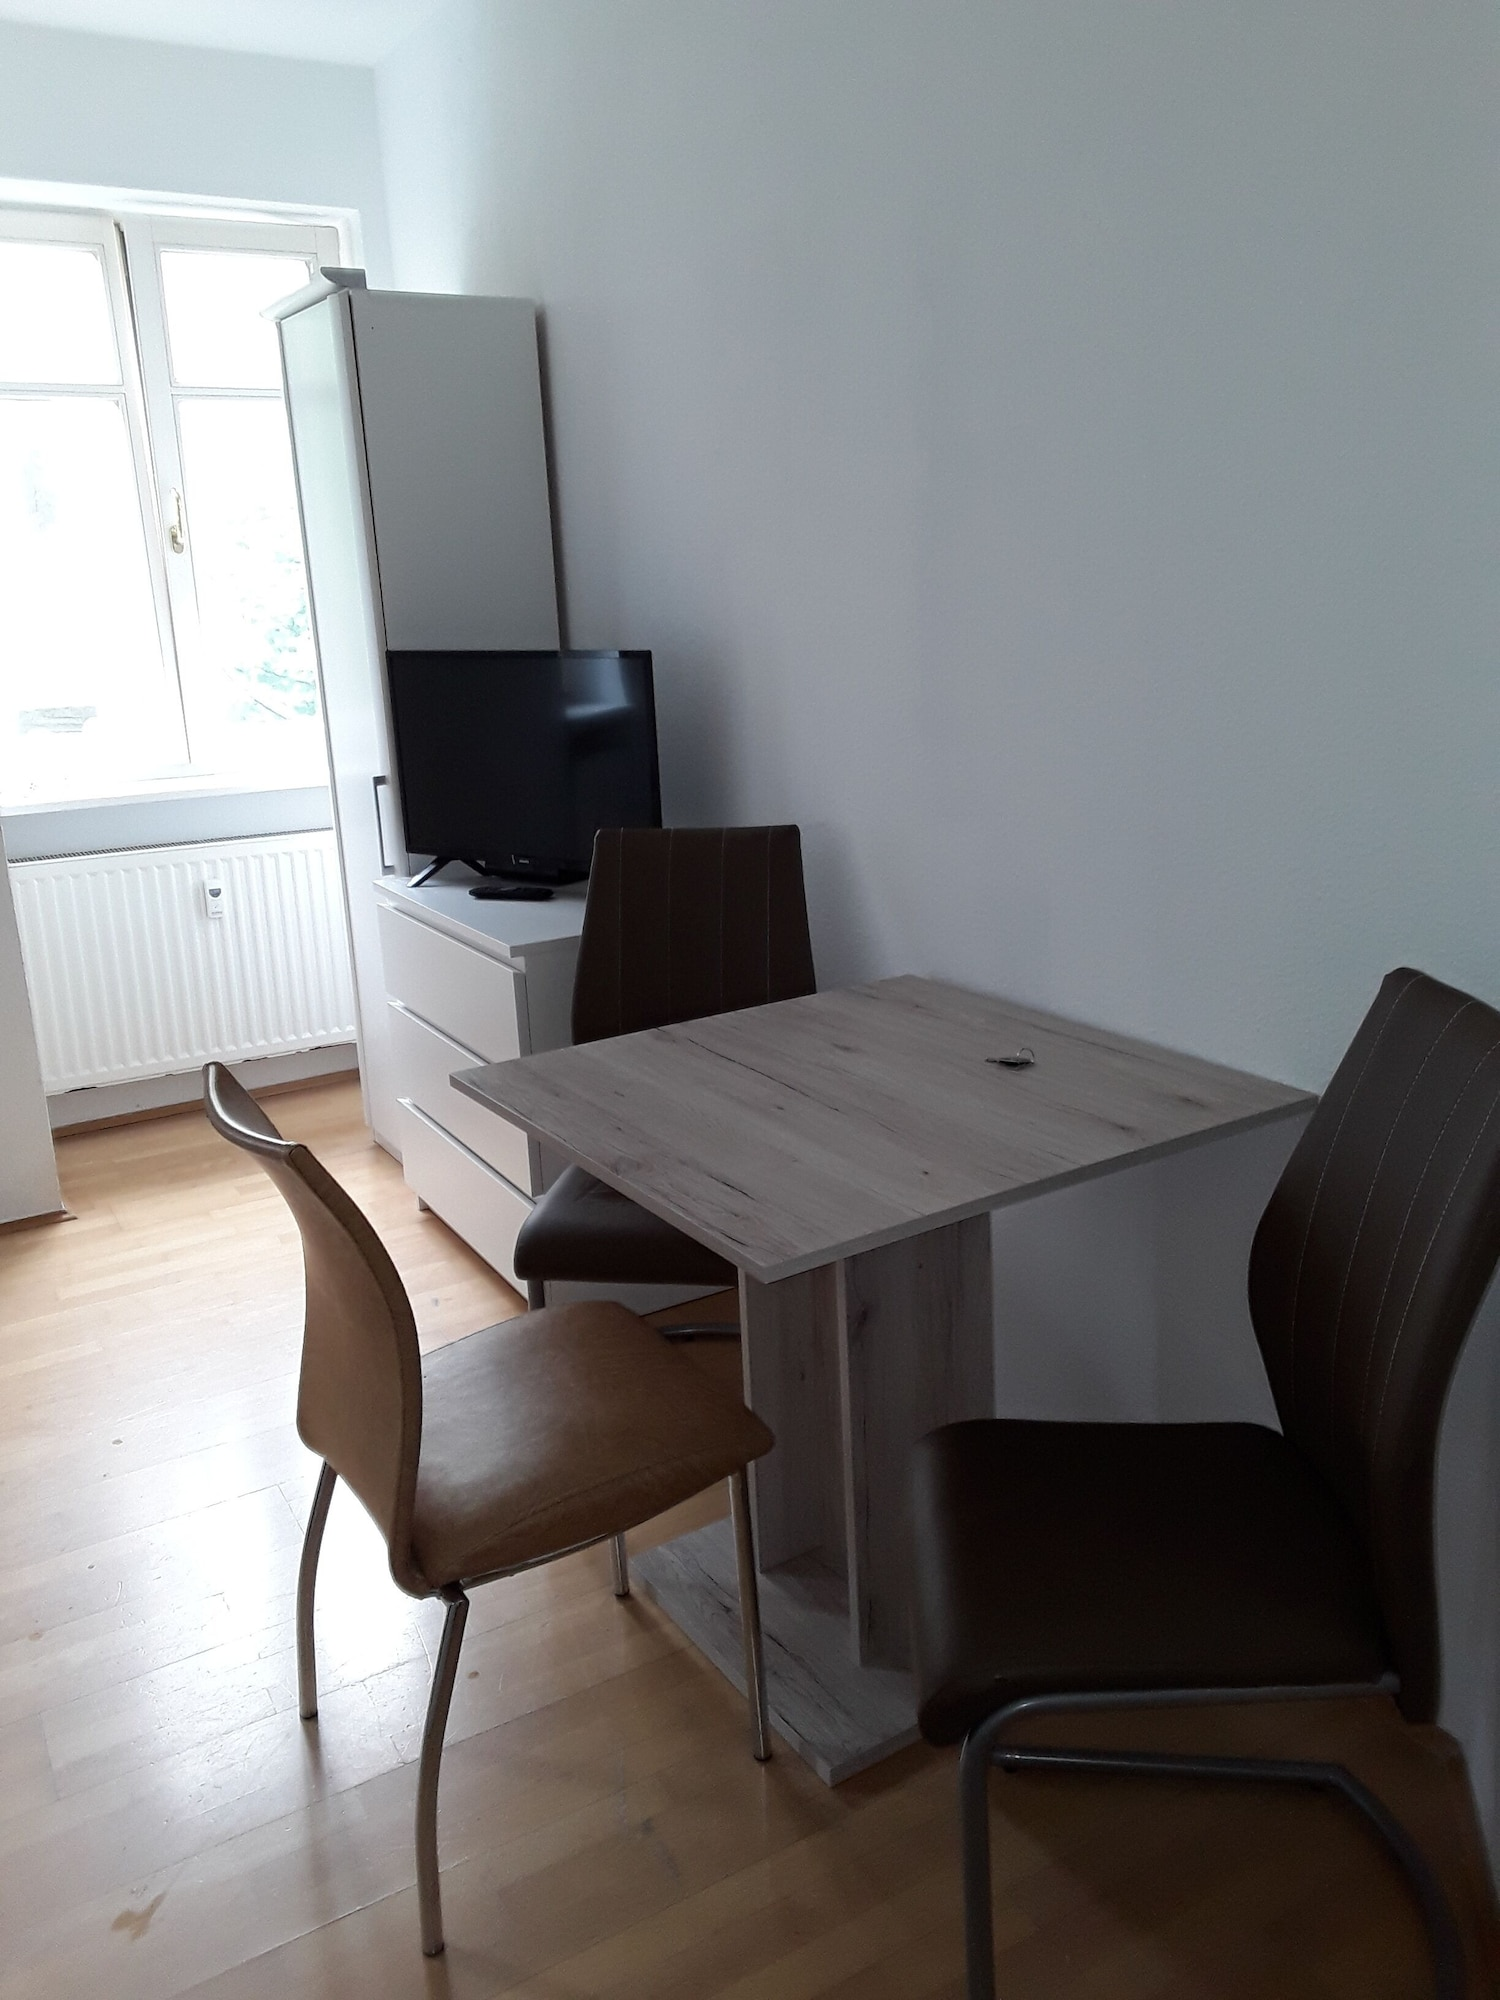 Apartments Sachsenallee, Chemnitz